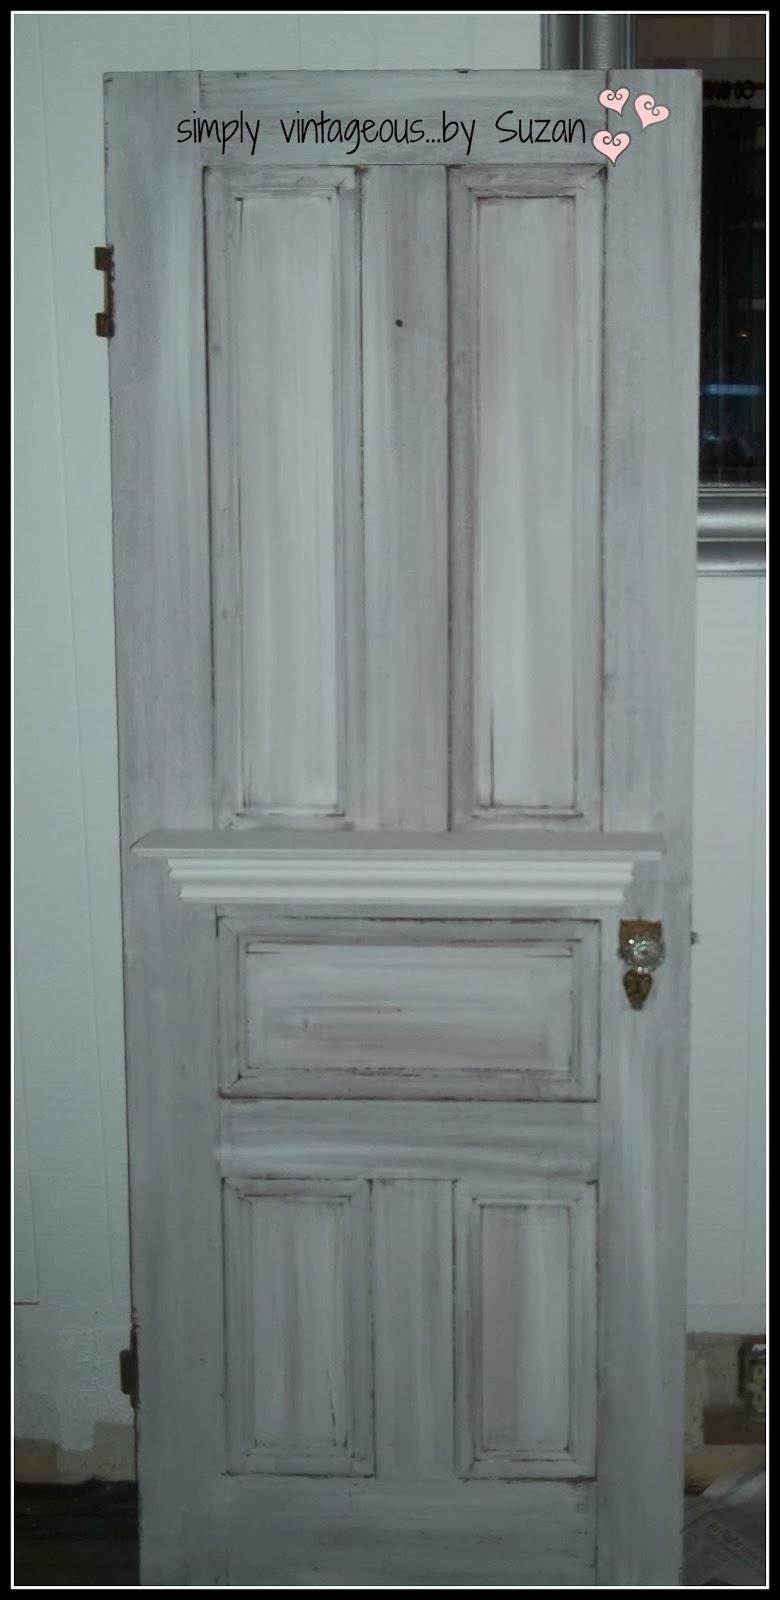 Adding a shelf to a vintage door